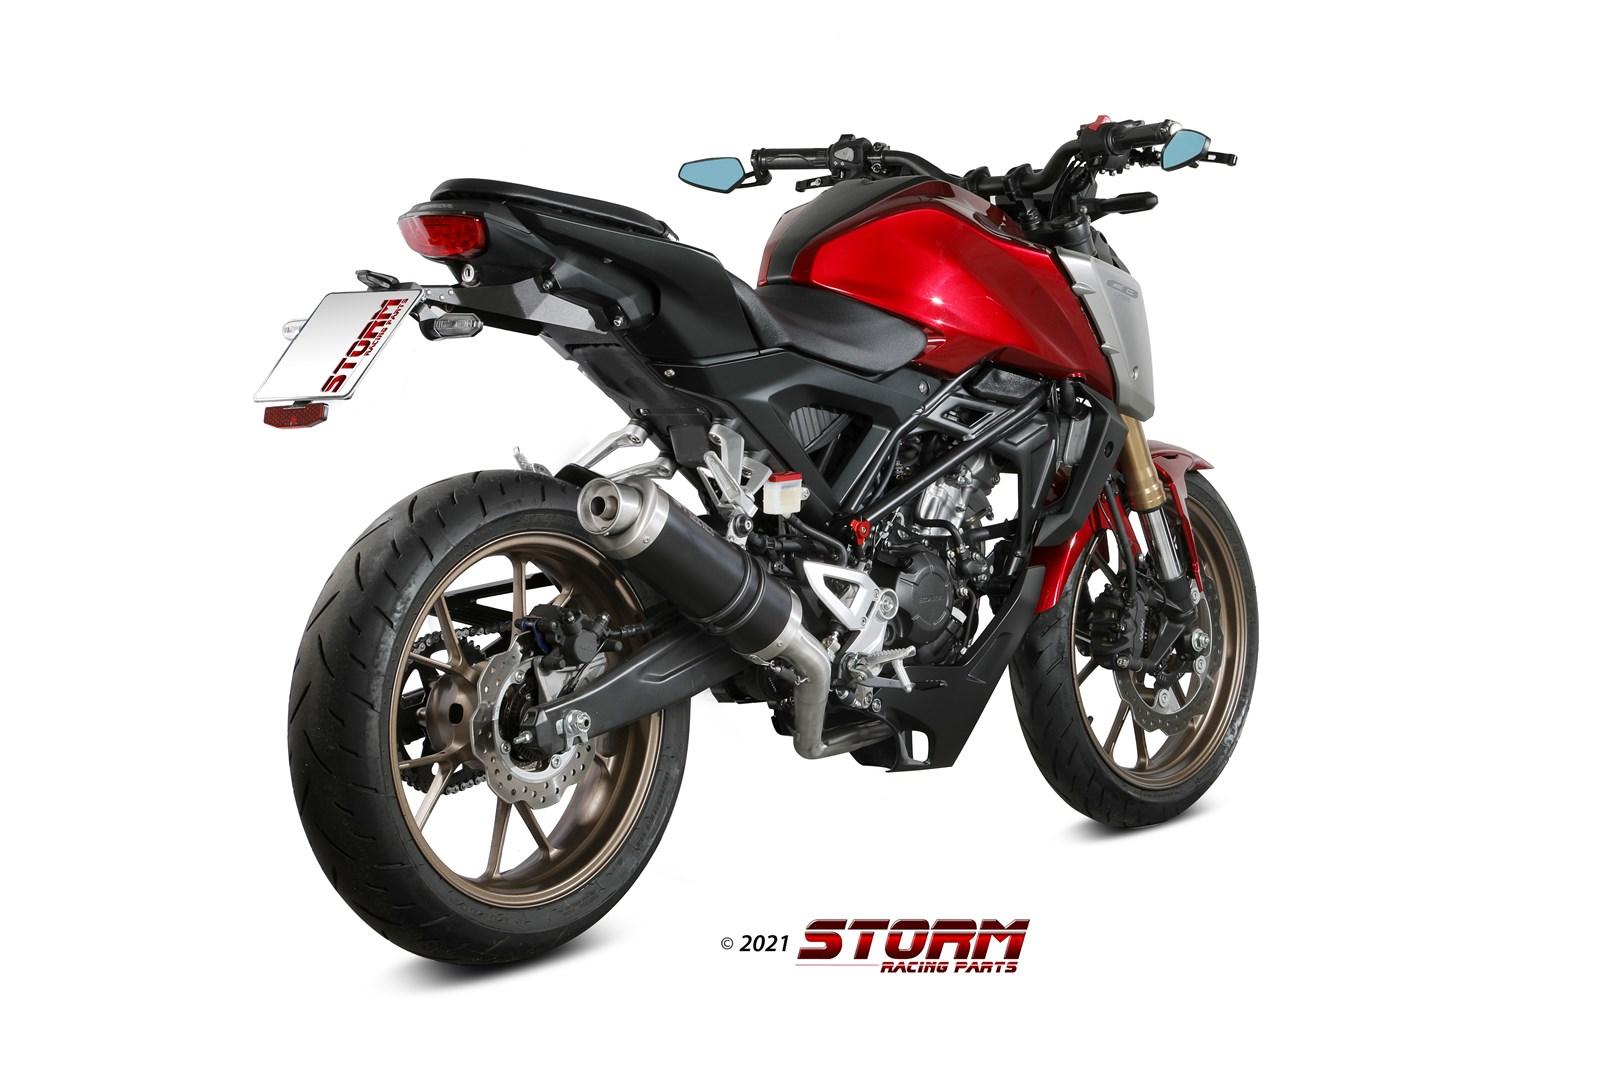 Honda_CB125R_2021-_74H077LXSB_$02